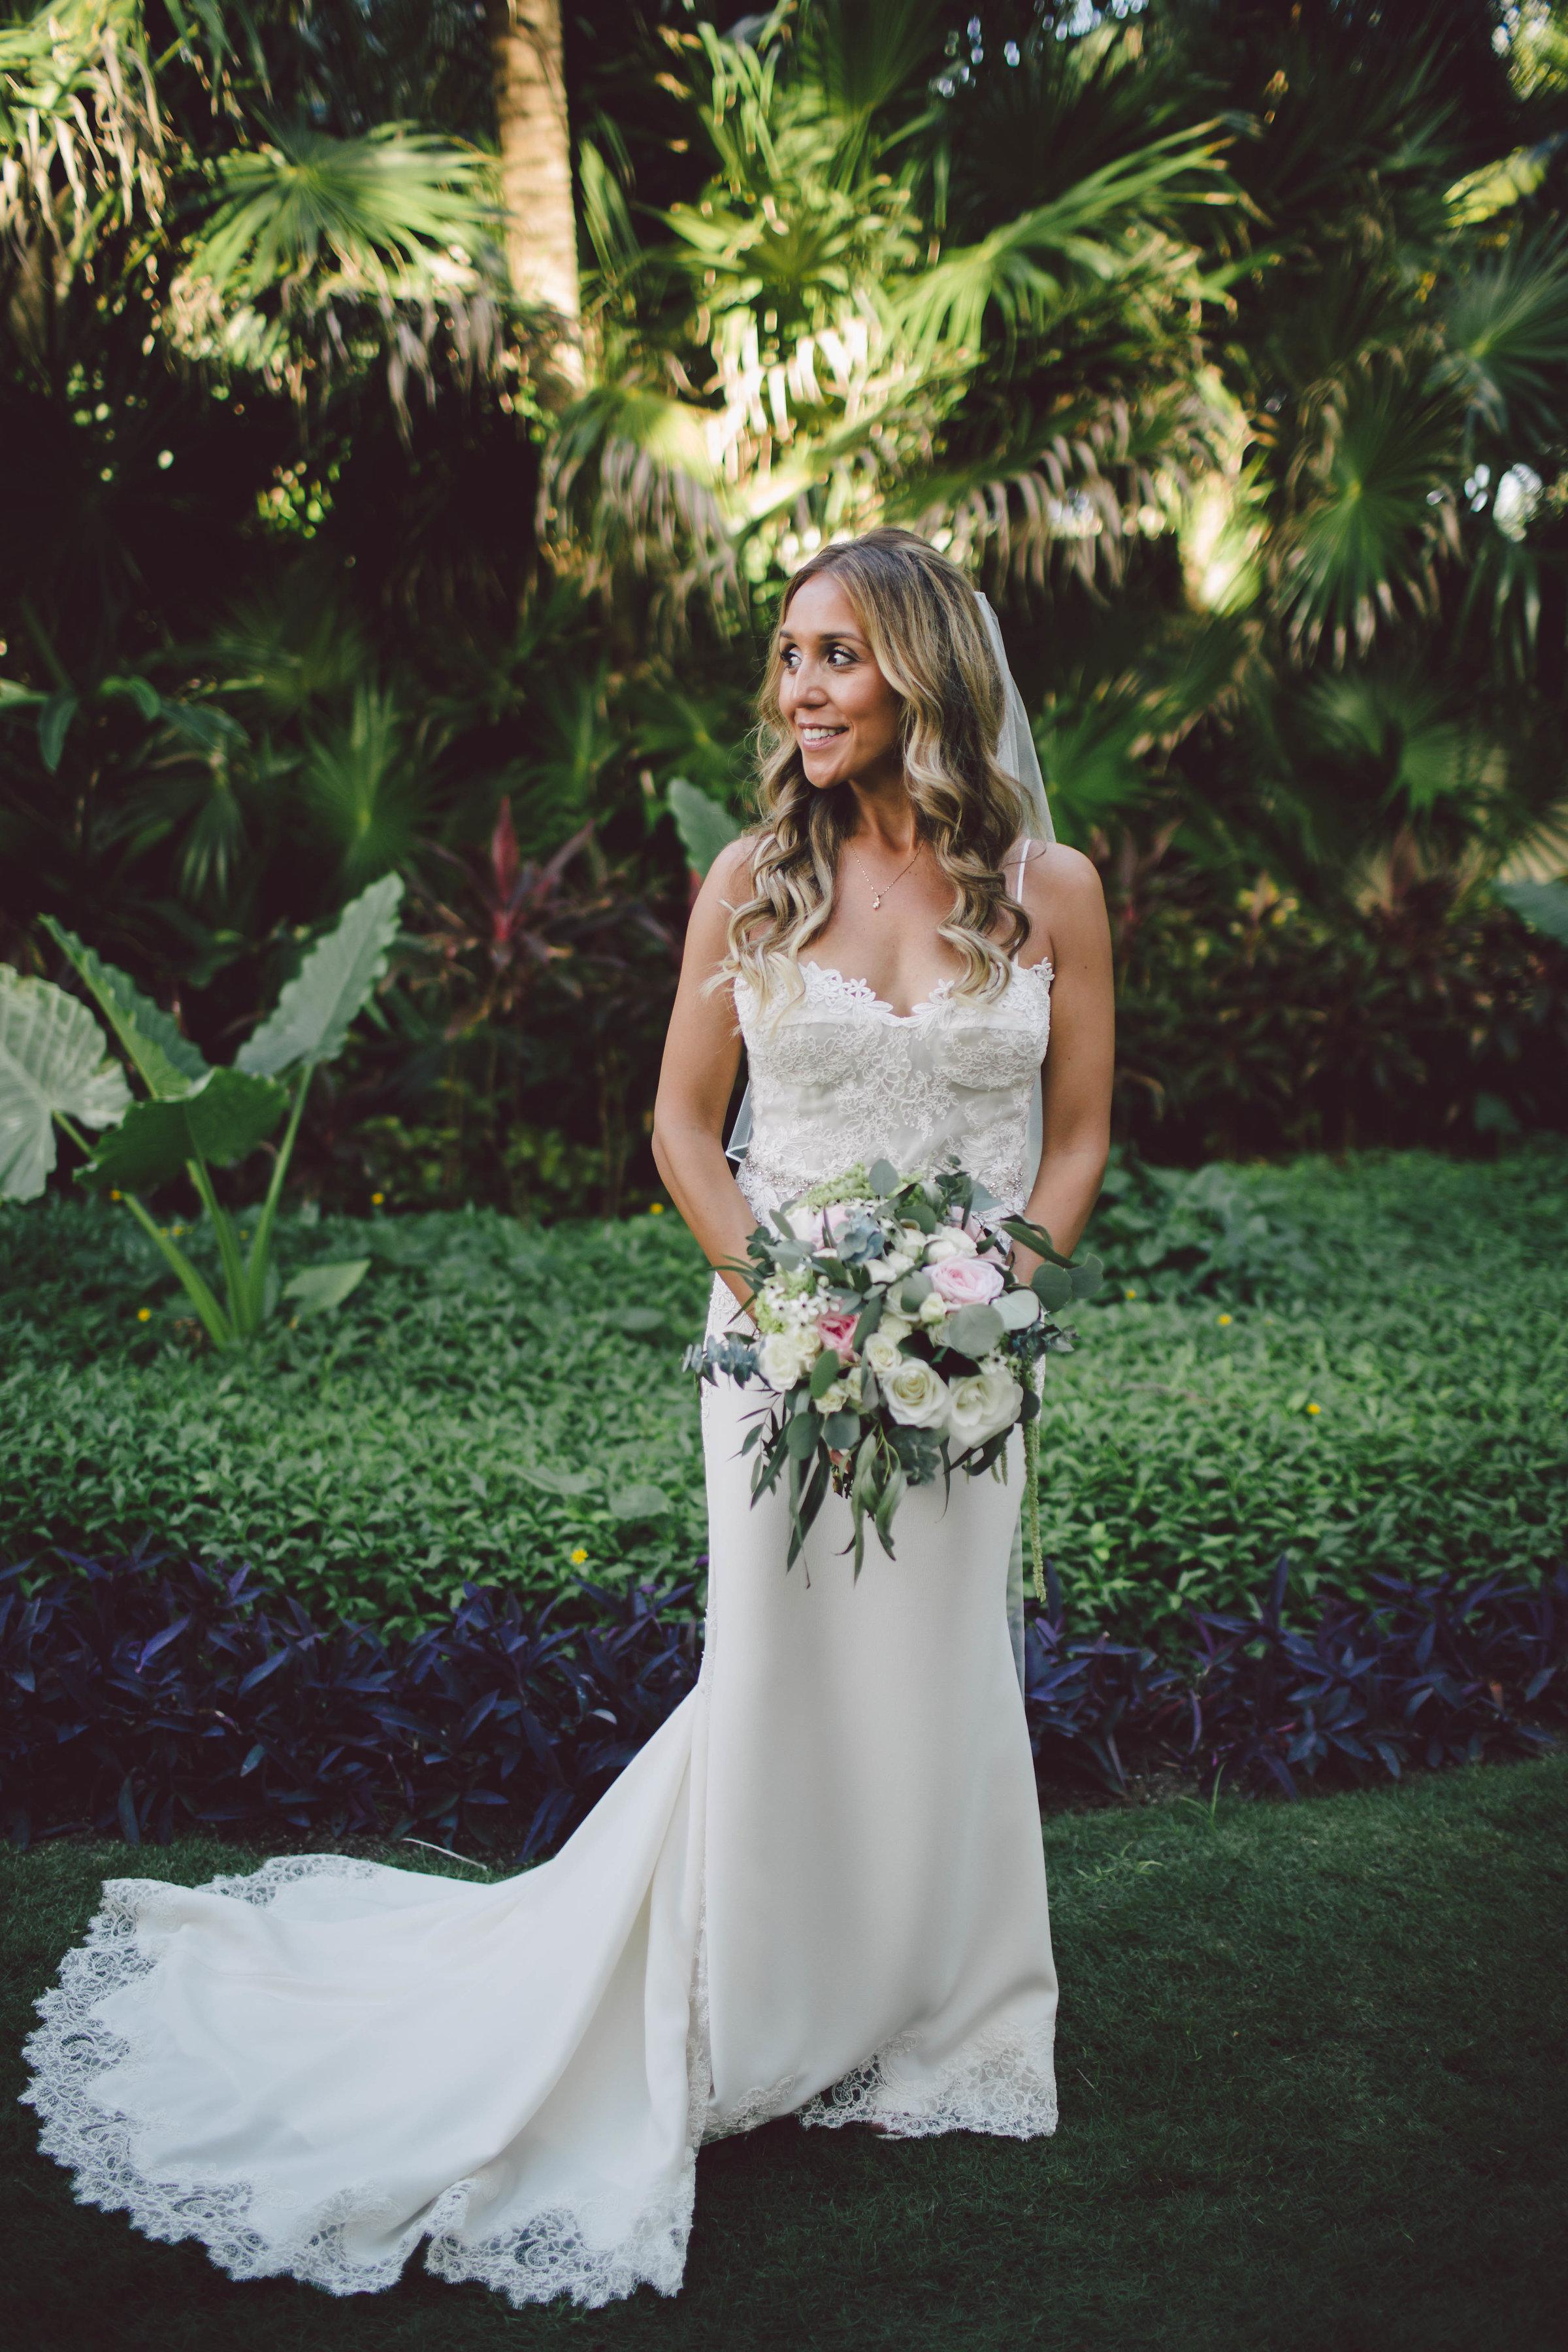 mexico_wedding_cancun_villa_la_joya_evangeline_lane_083.jpg